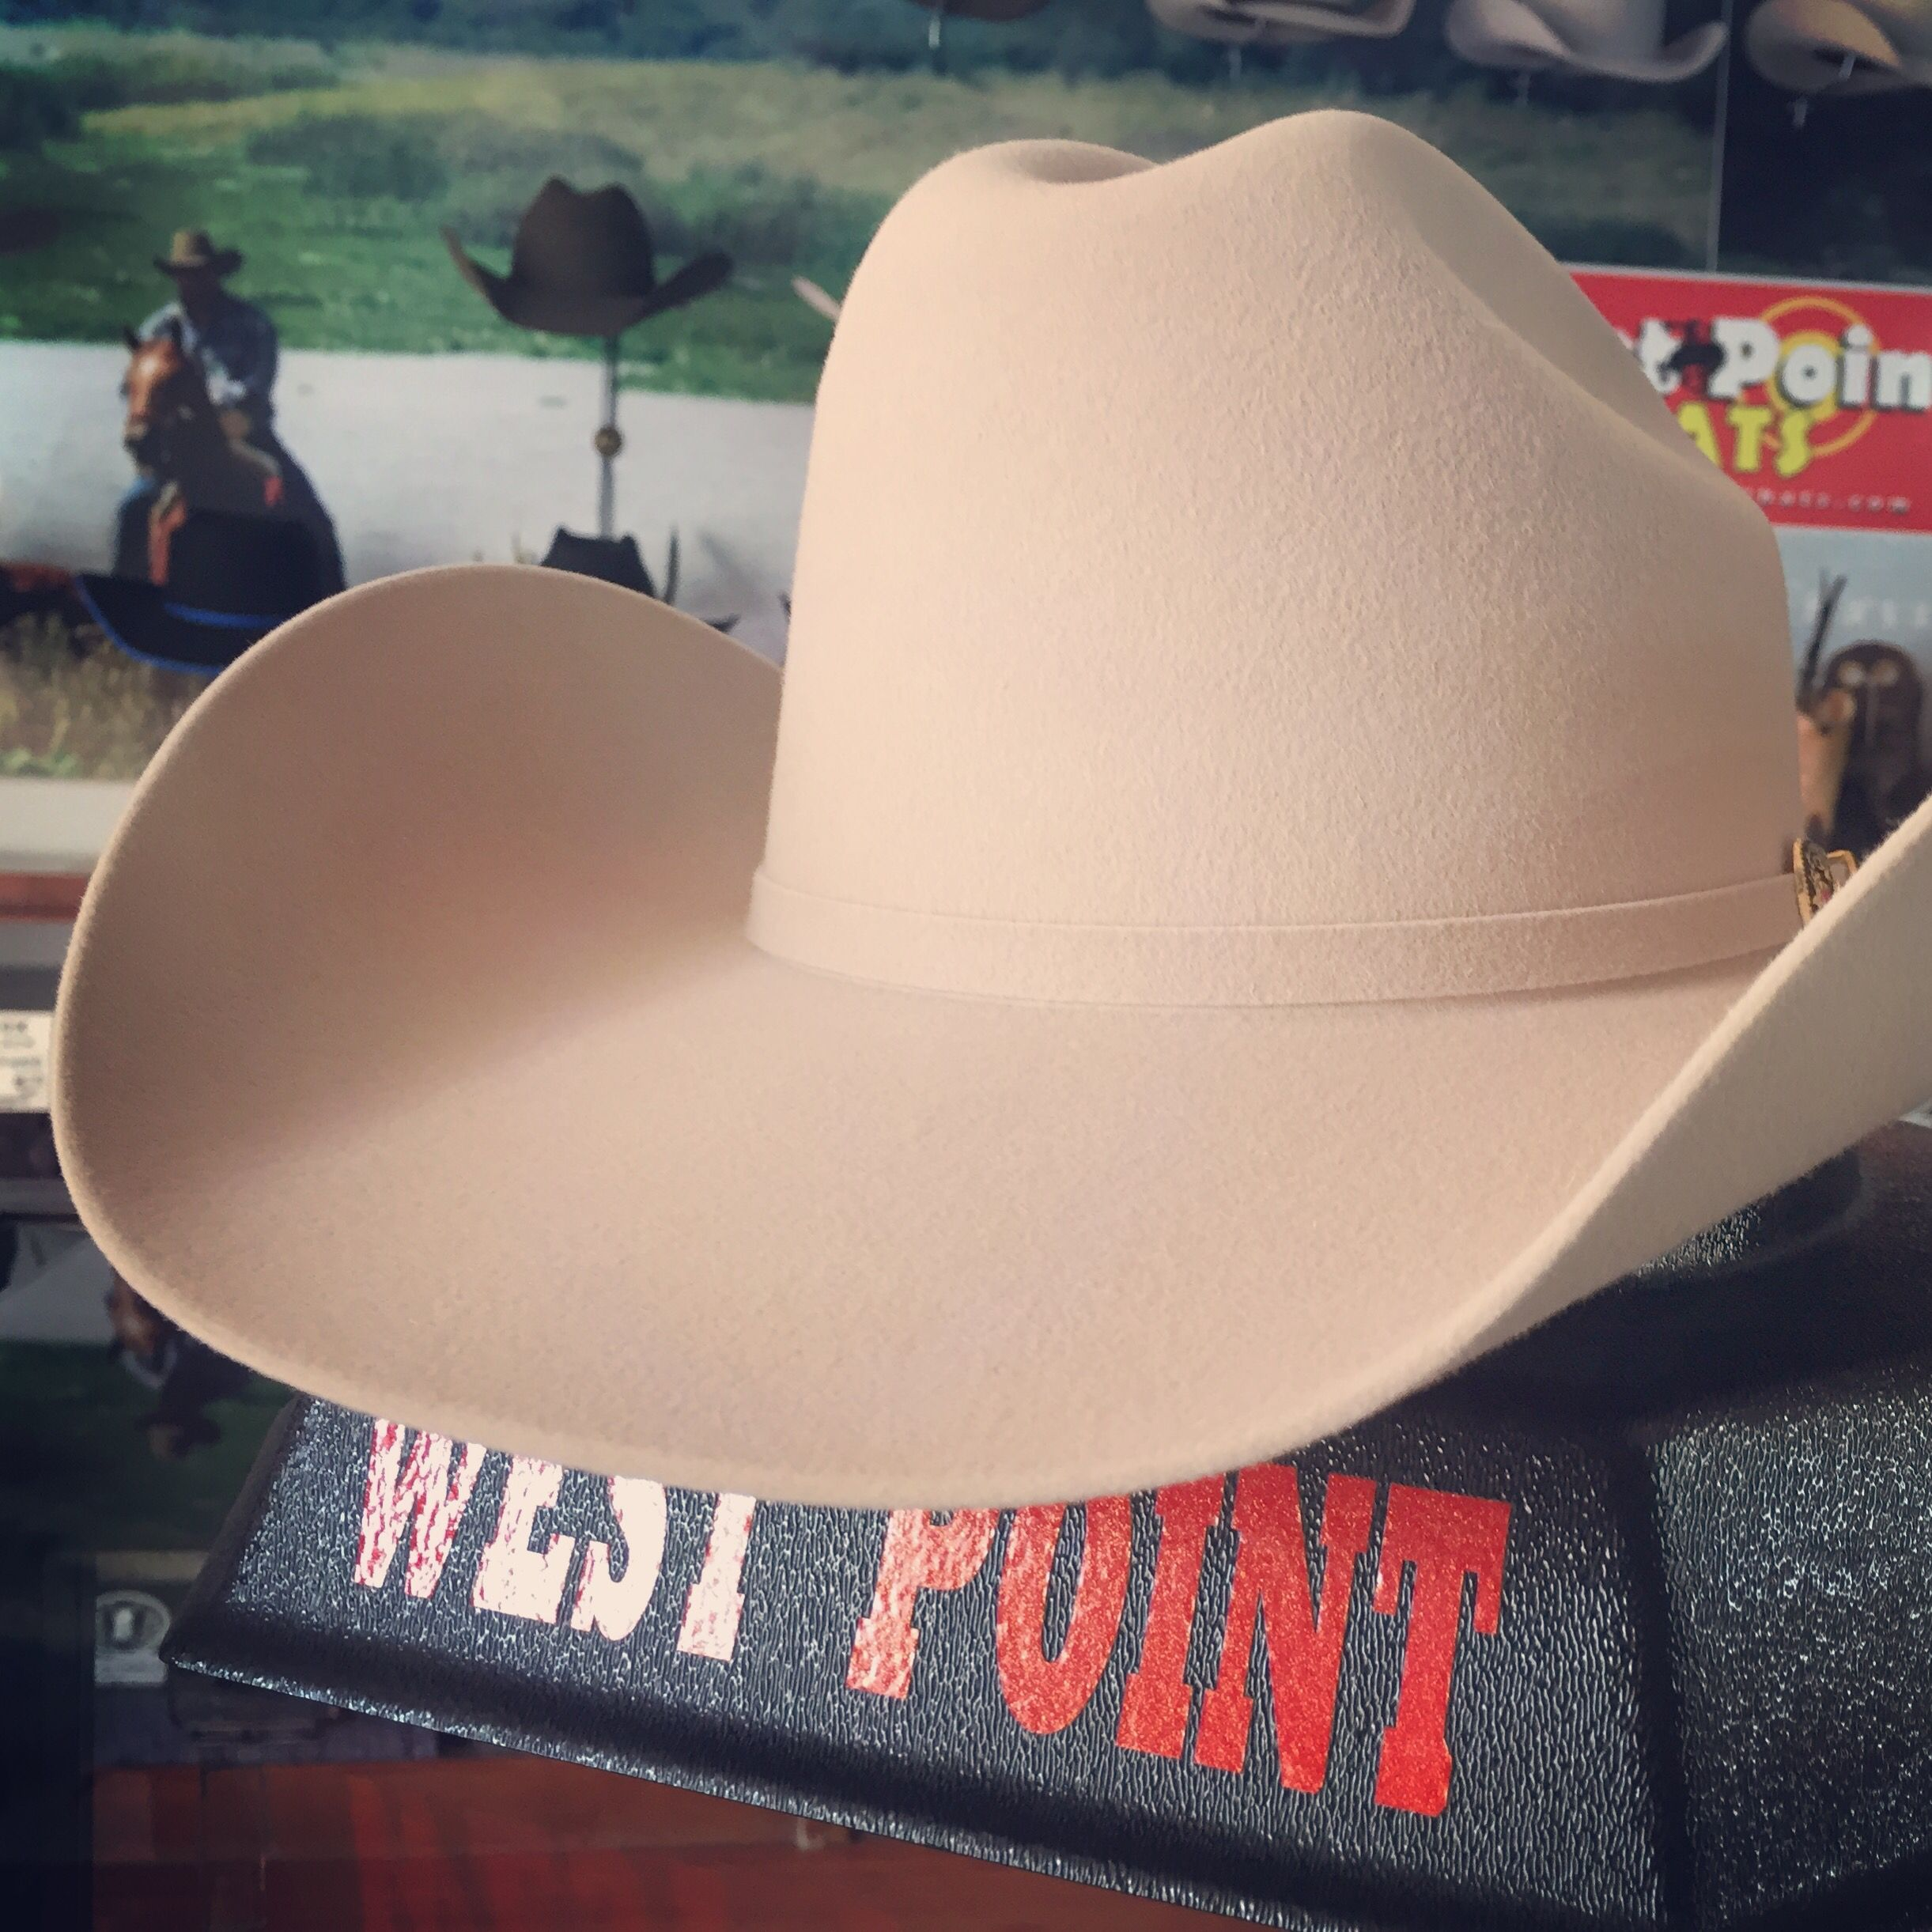 Gánate 1  texana  2Ox y 1  estuche  westpointhats Compra ... 136ece0dd4d